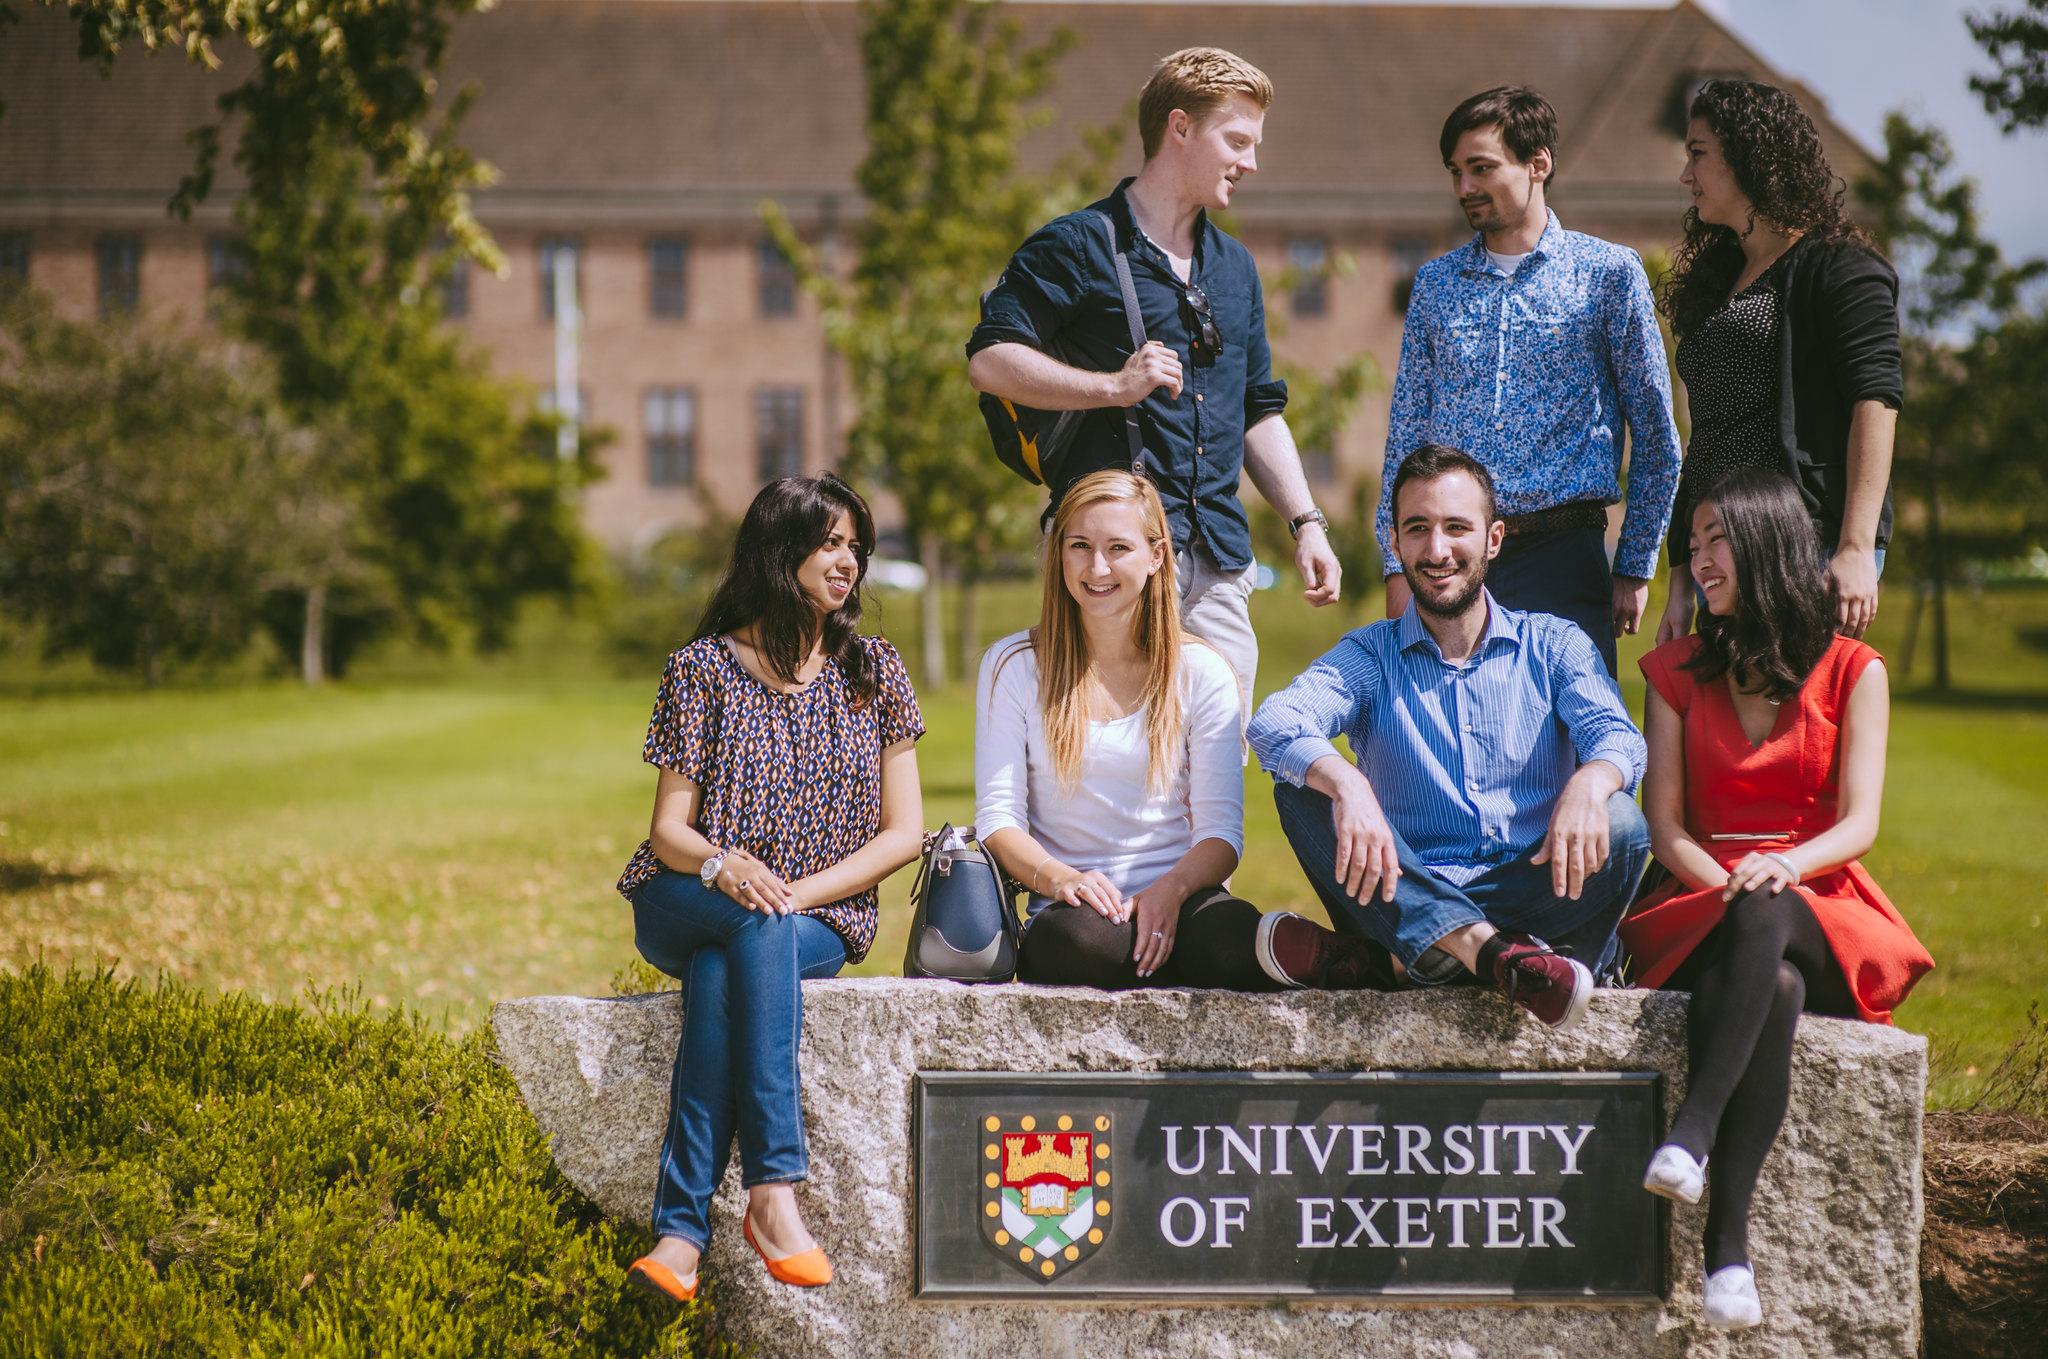 University of Exeter – International Student Scholarships for Africans